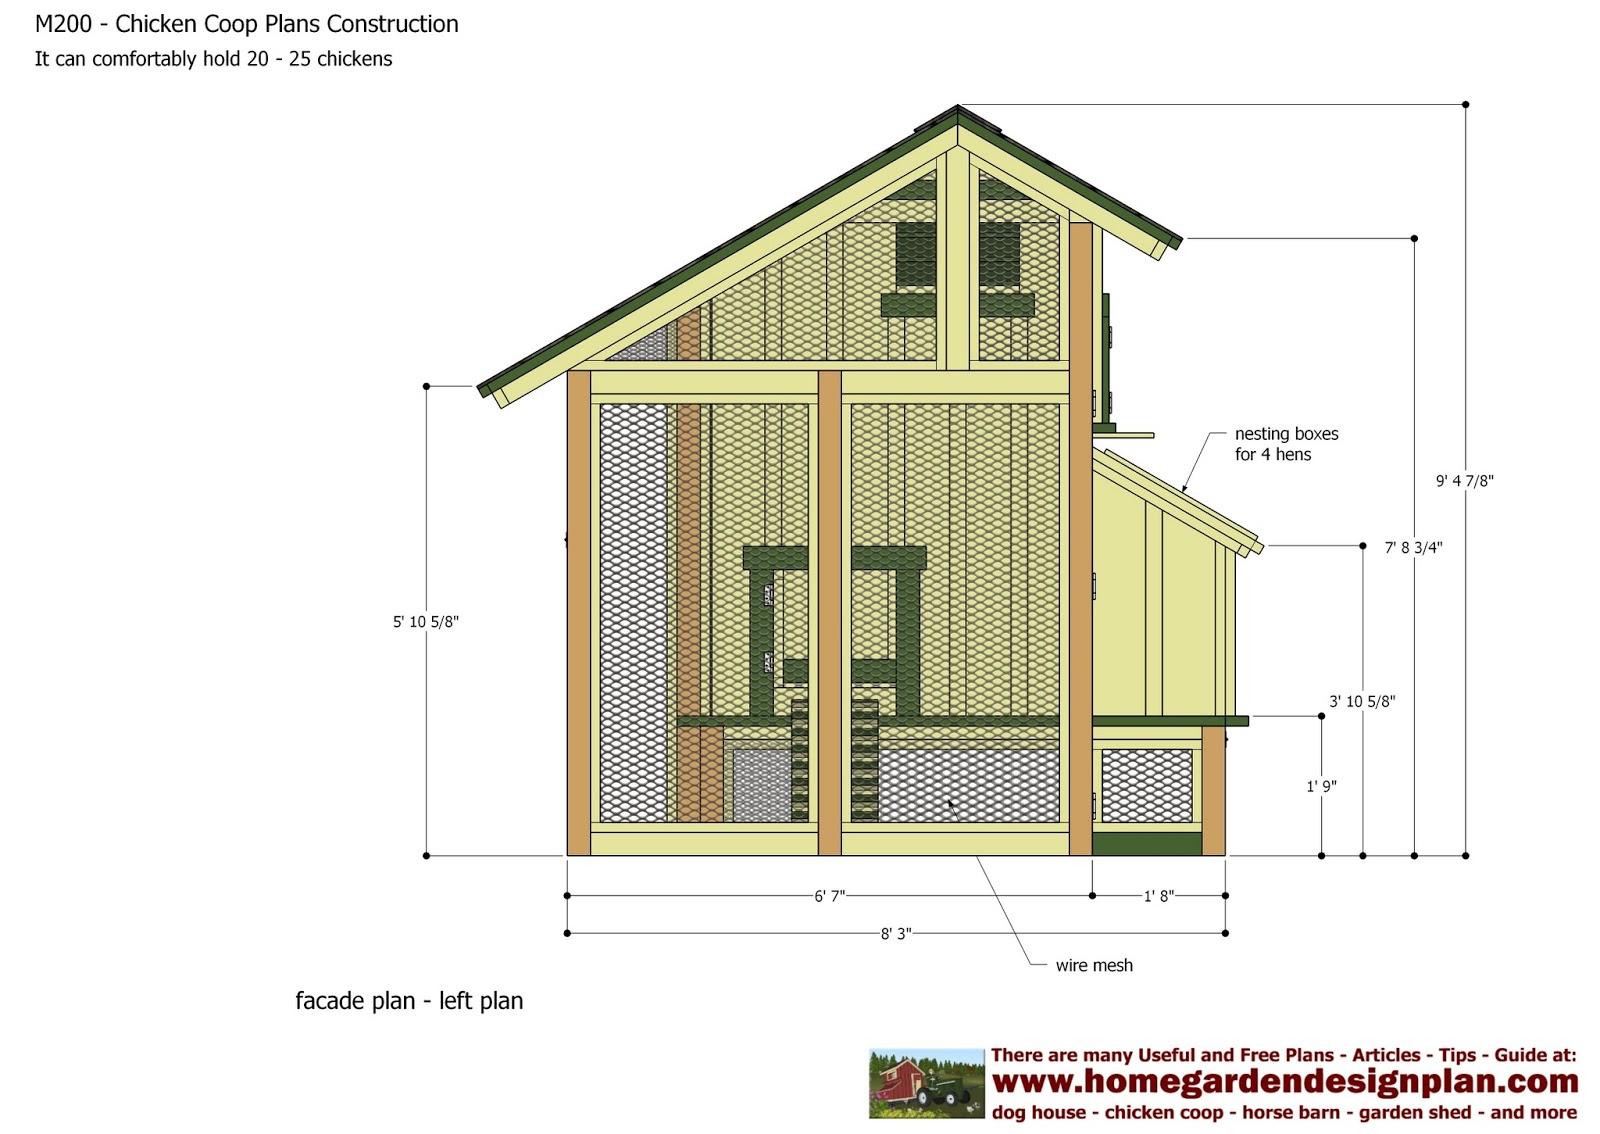 home garden plans: M200 - Chicken Coop Plans Construction ...